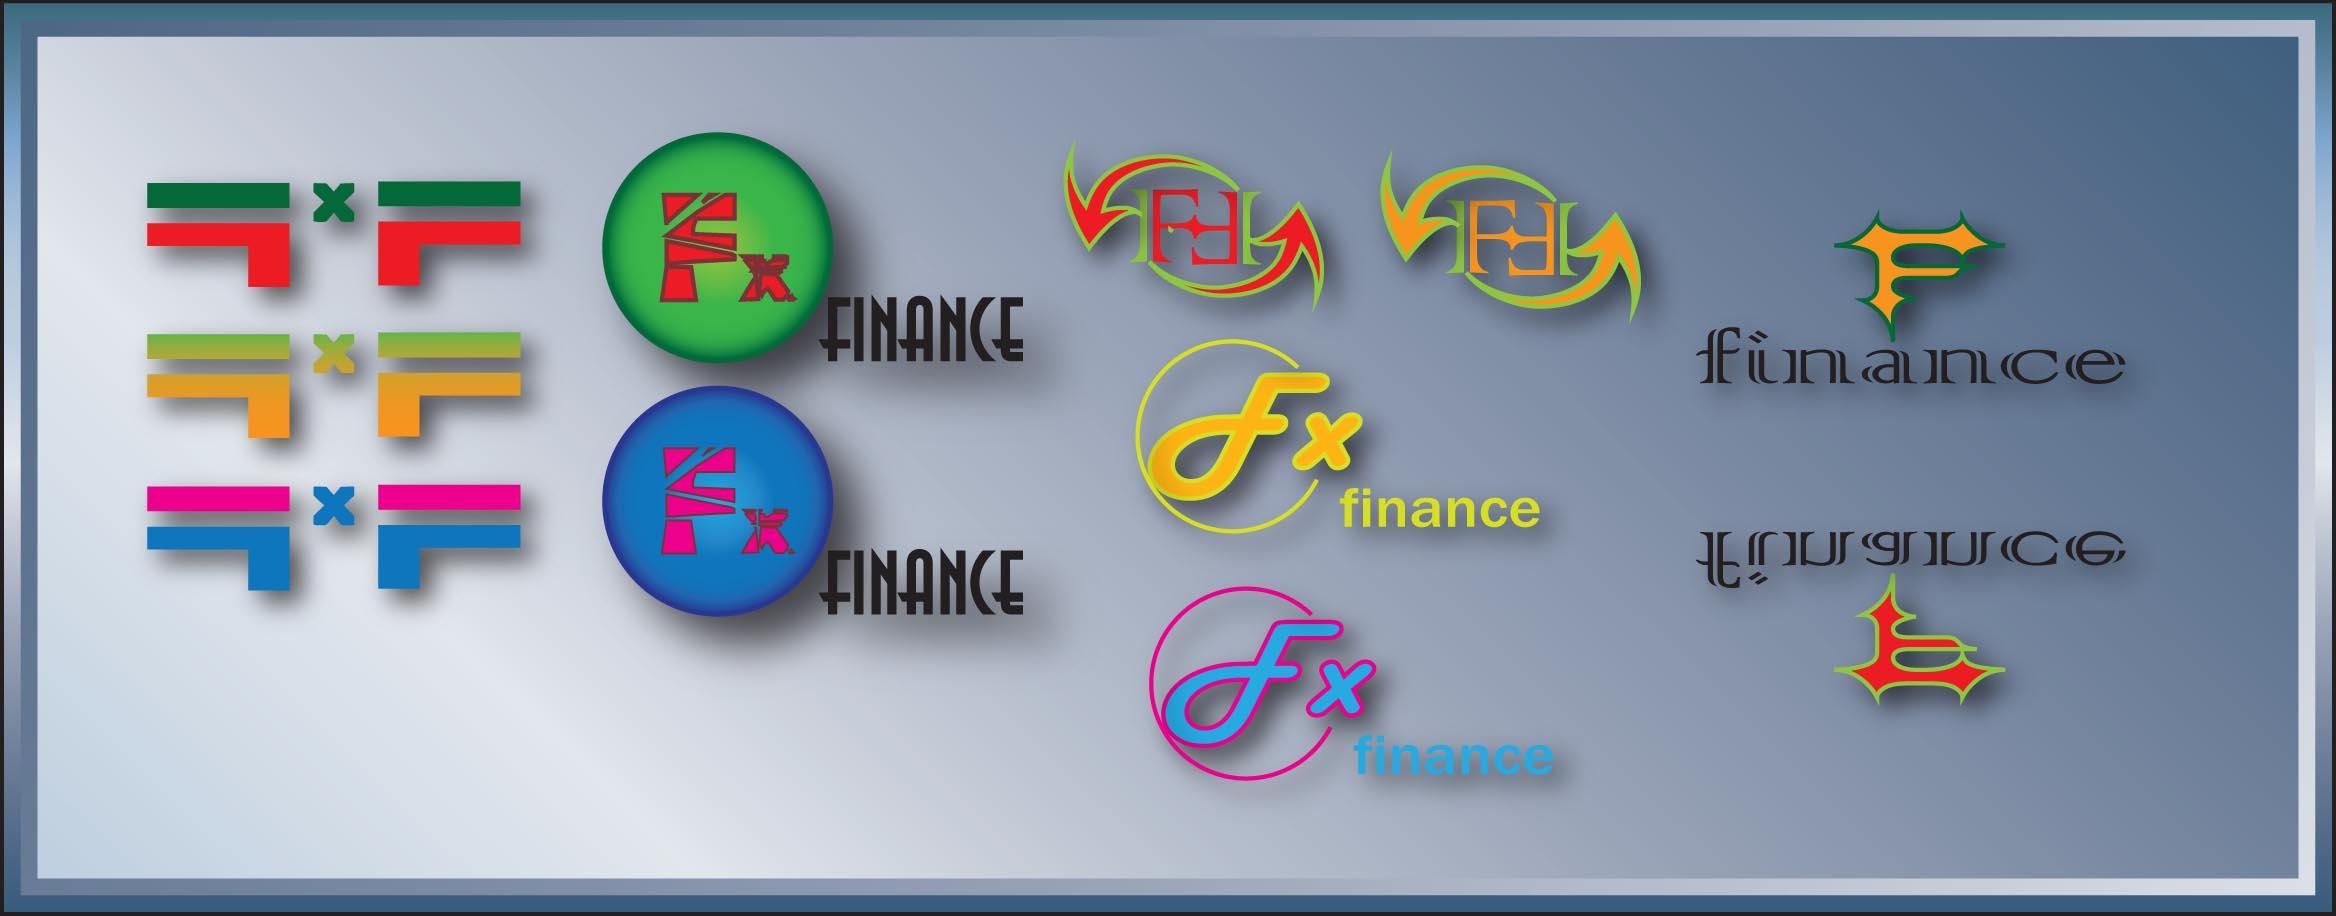 Разработка логотипа для компании FxFinance фото f_3065118cf45cd590.jpg